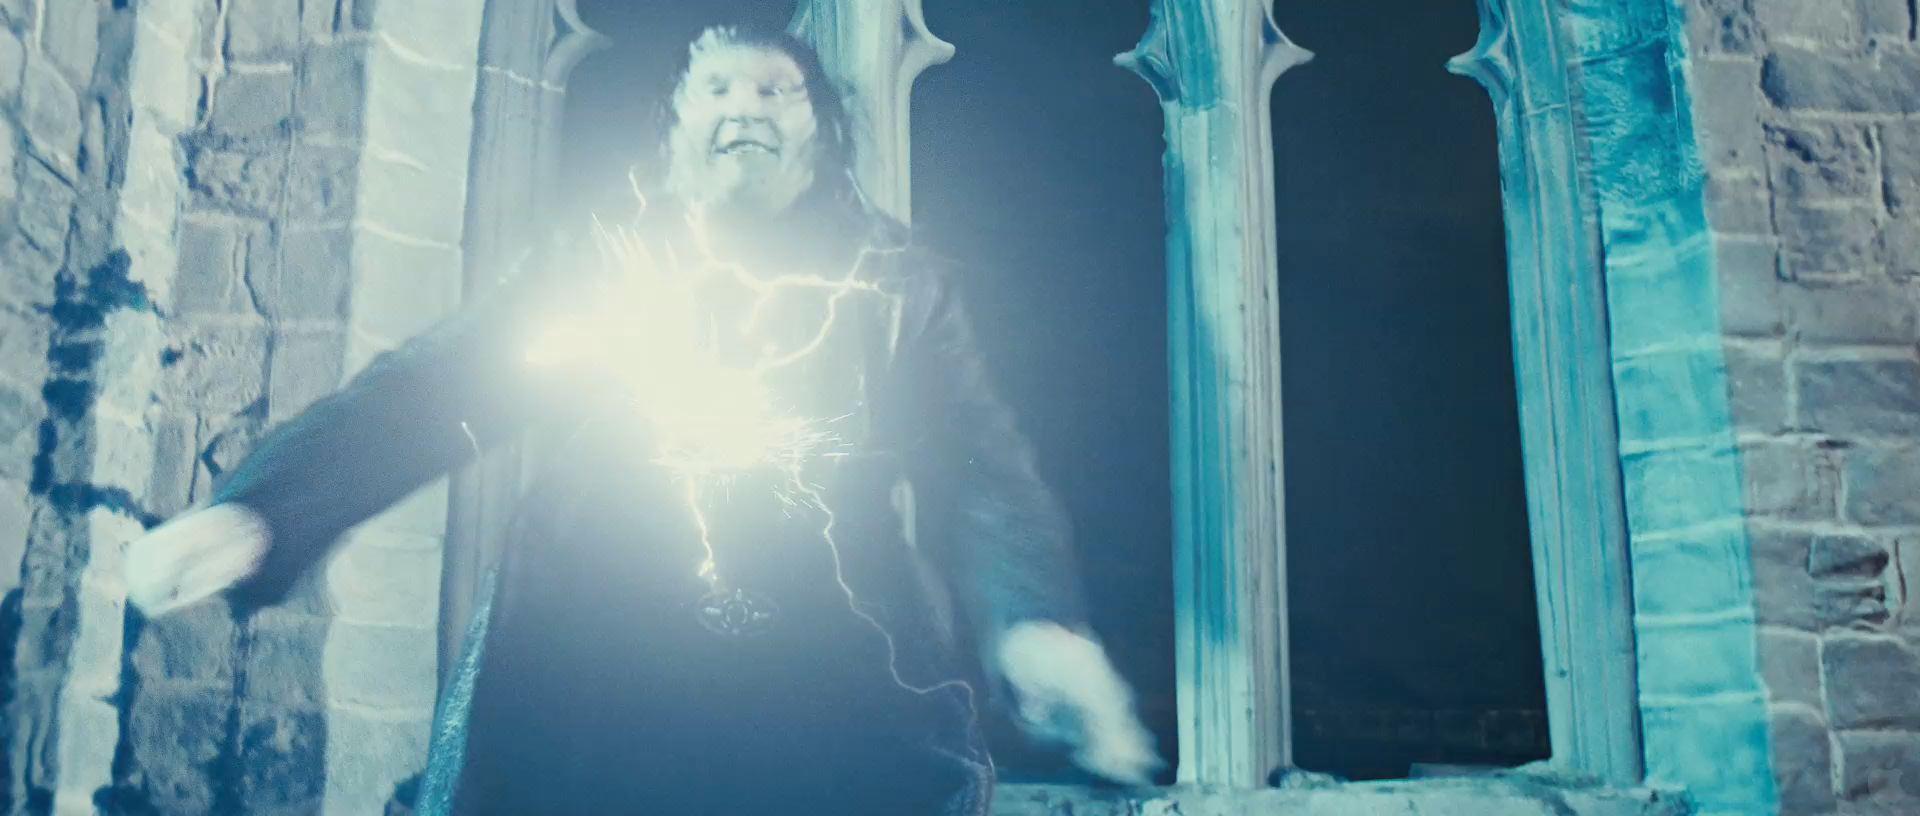 Harry Potter BlogHogwarts HP7 2 Trailer 11